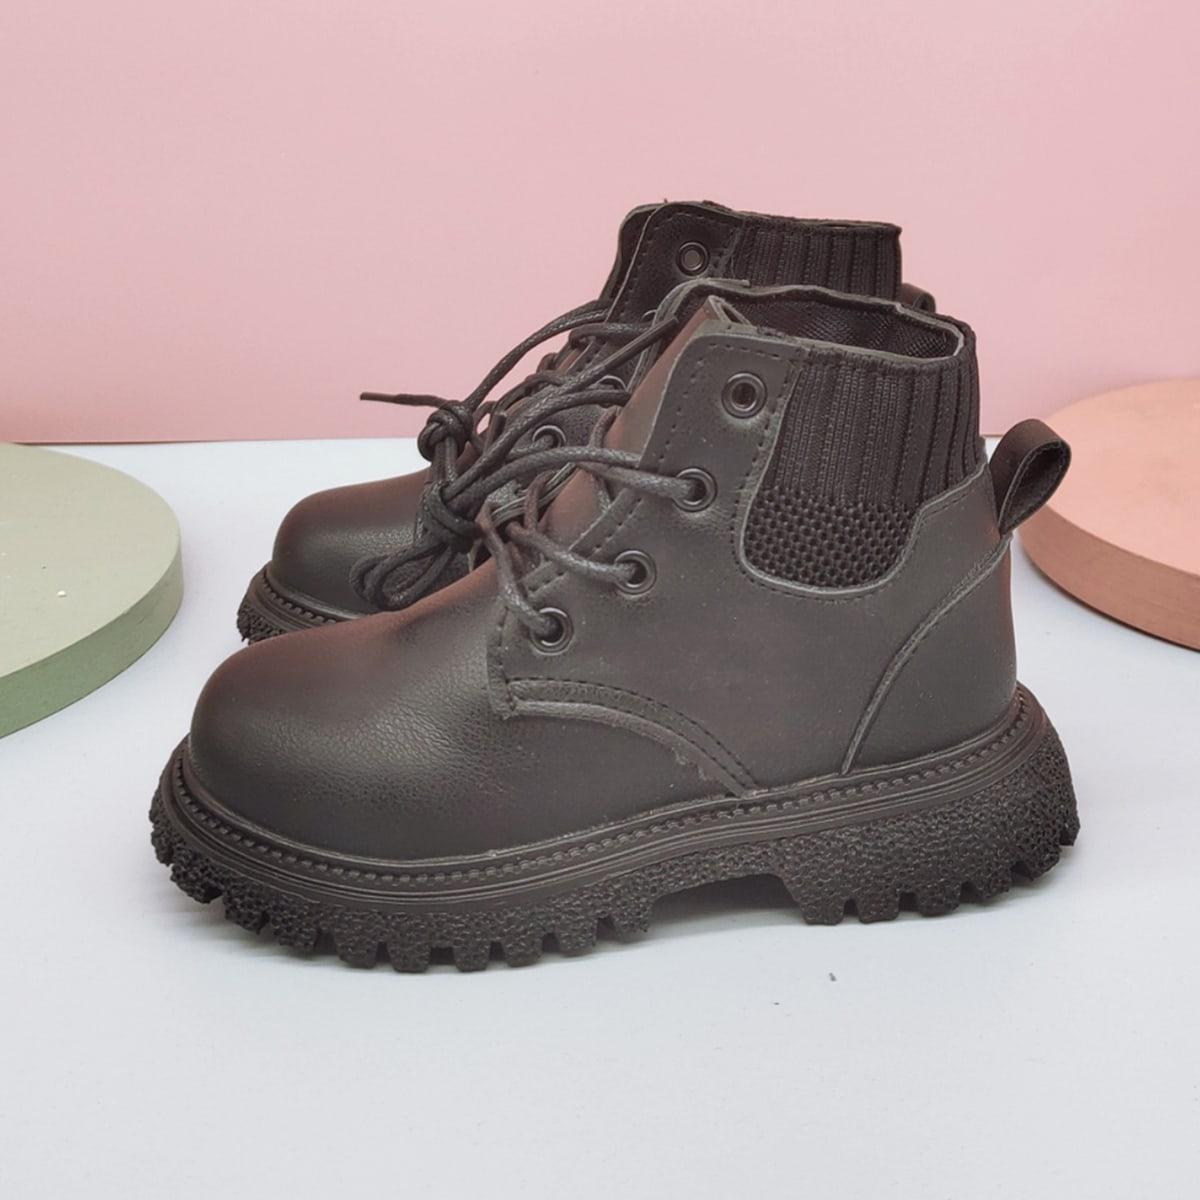 Ботинки на шнурках для мальчиков SheIn sk2108081722411193